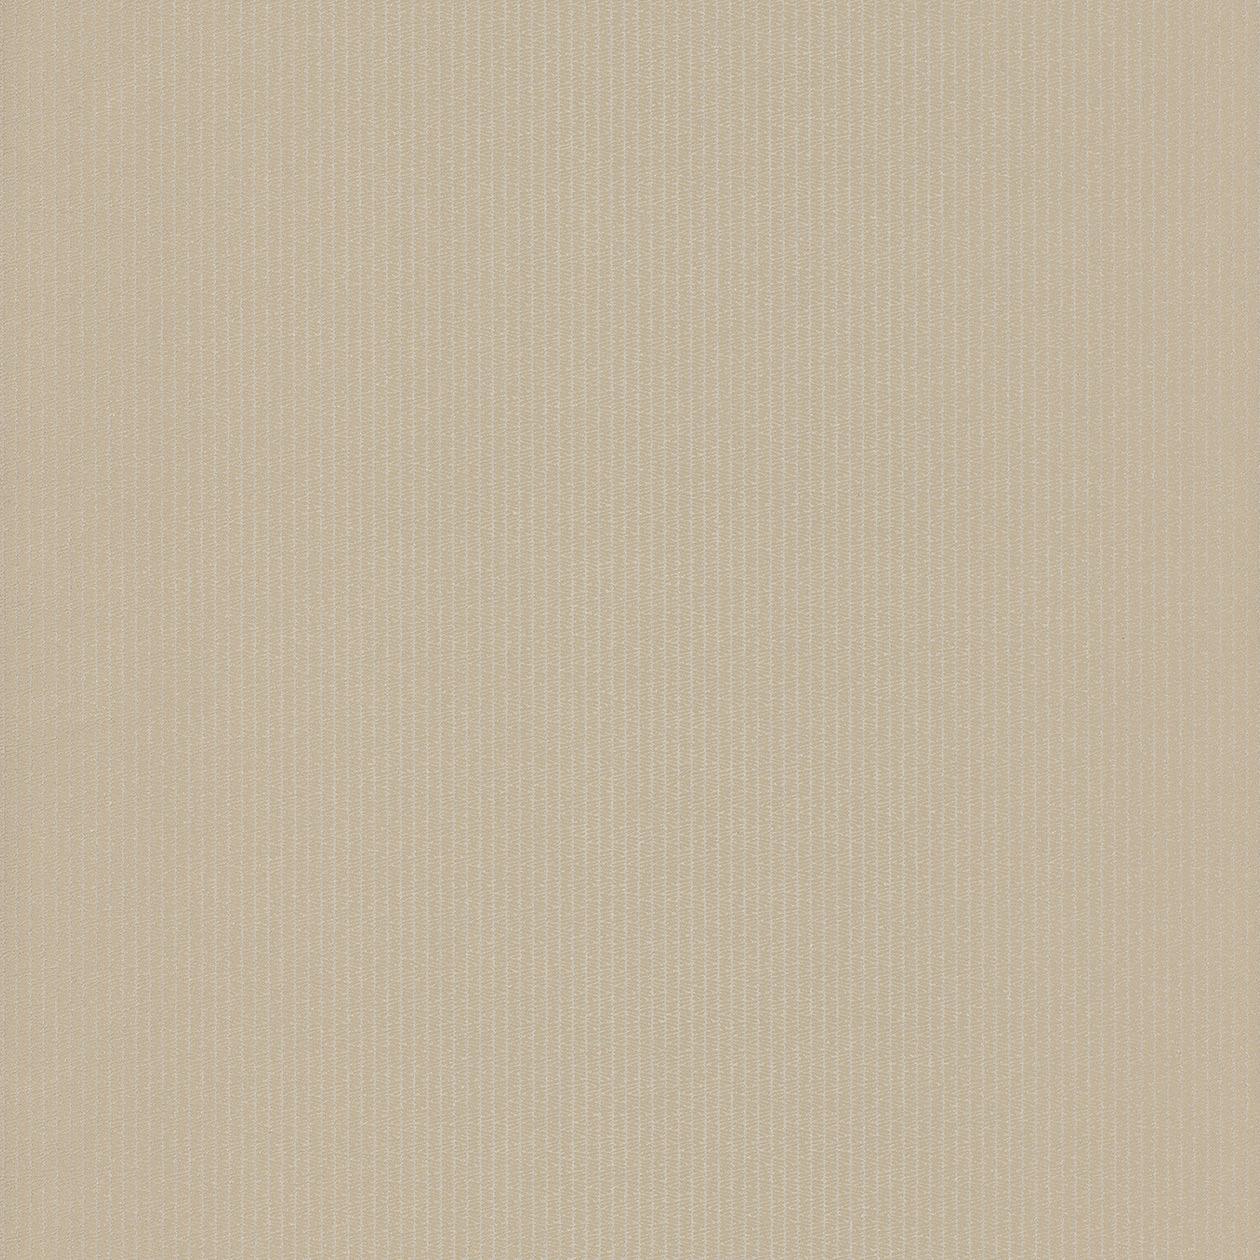 Французские обои Caselio,  коллекция Trio, артикулTIO68011155